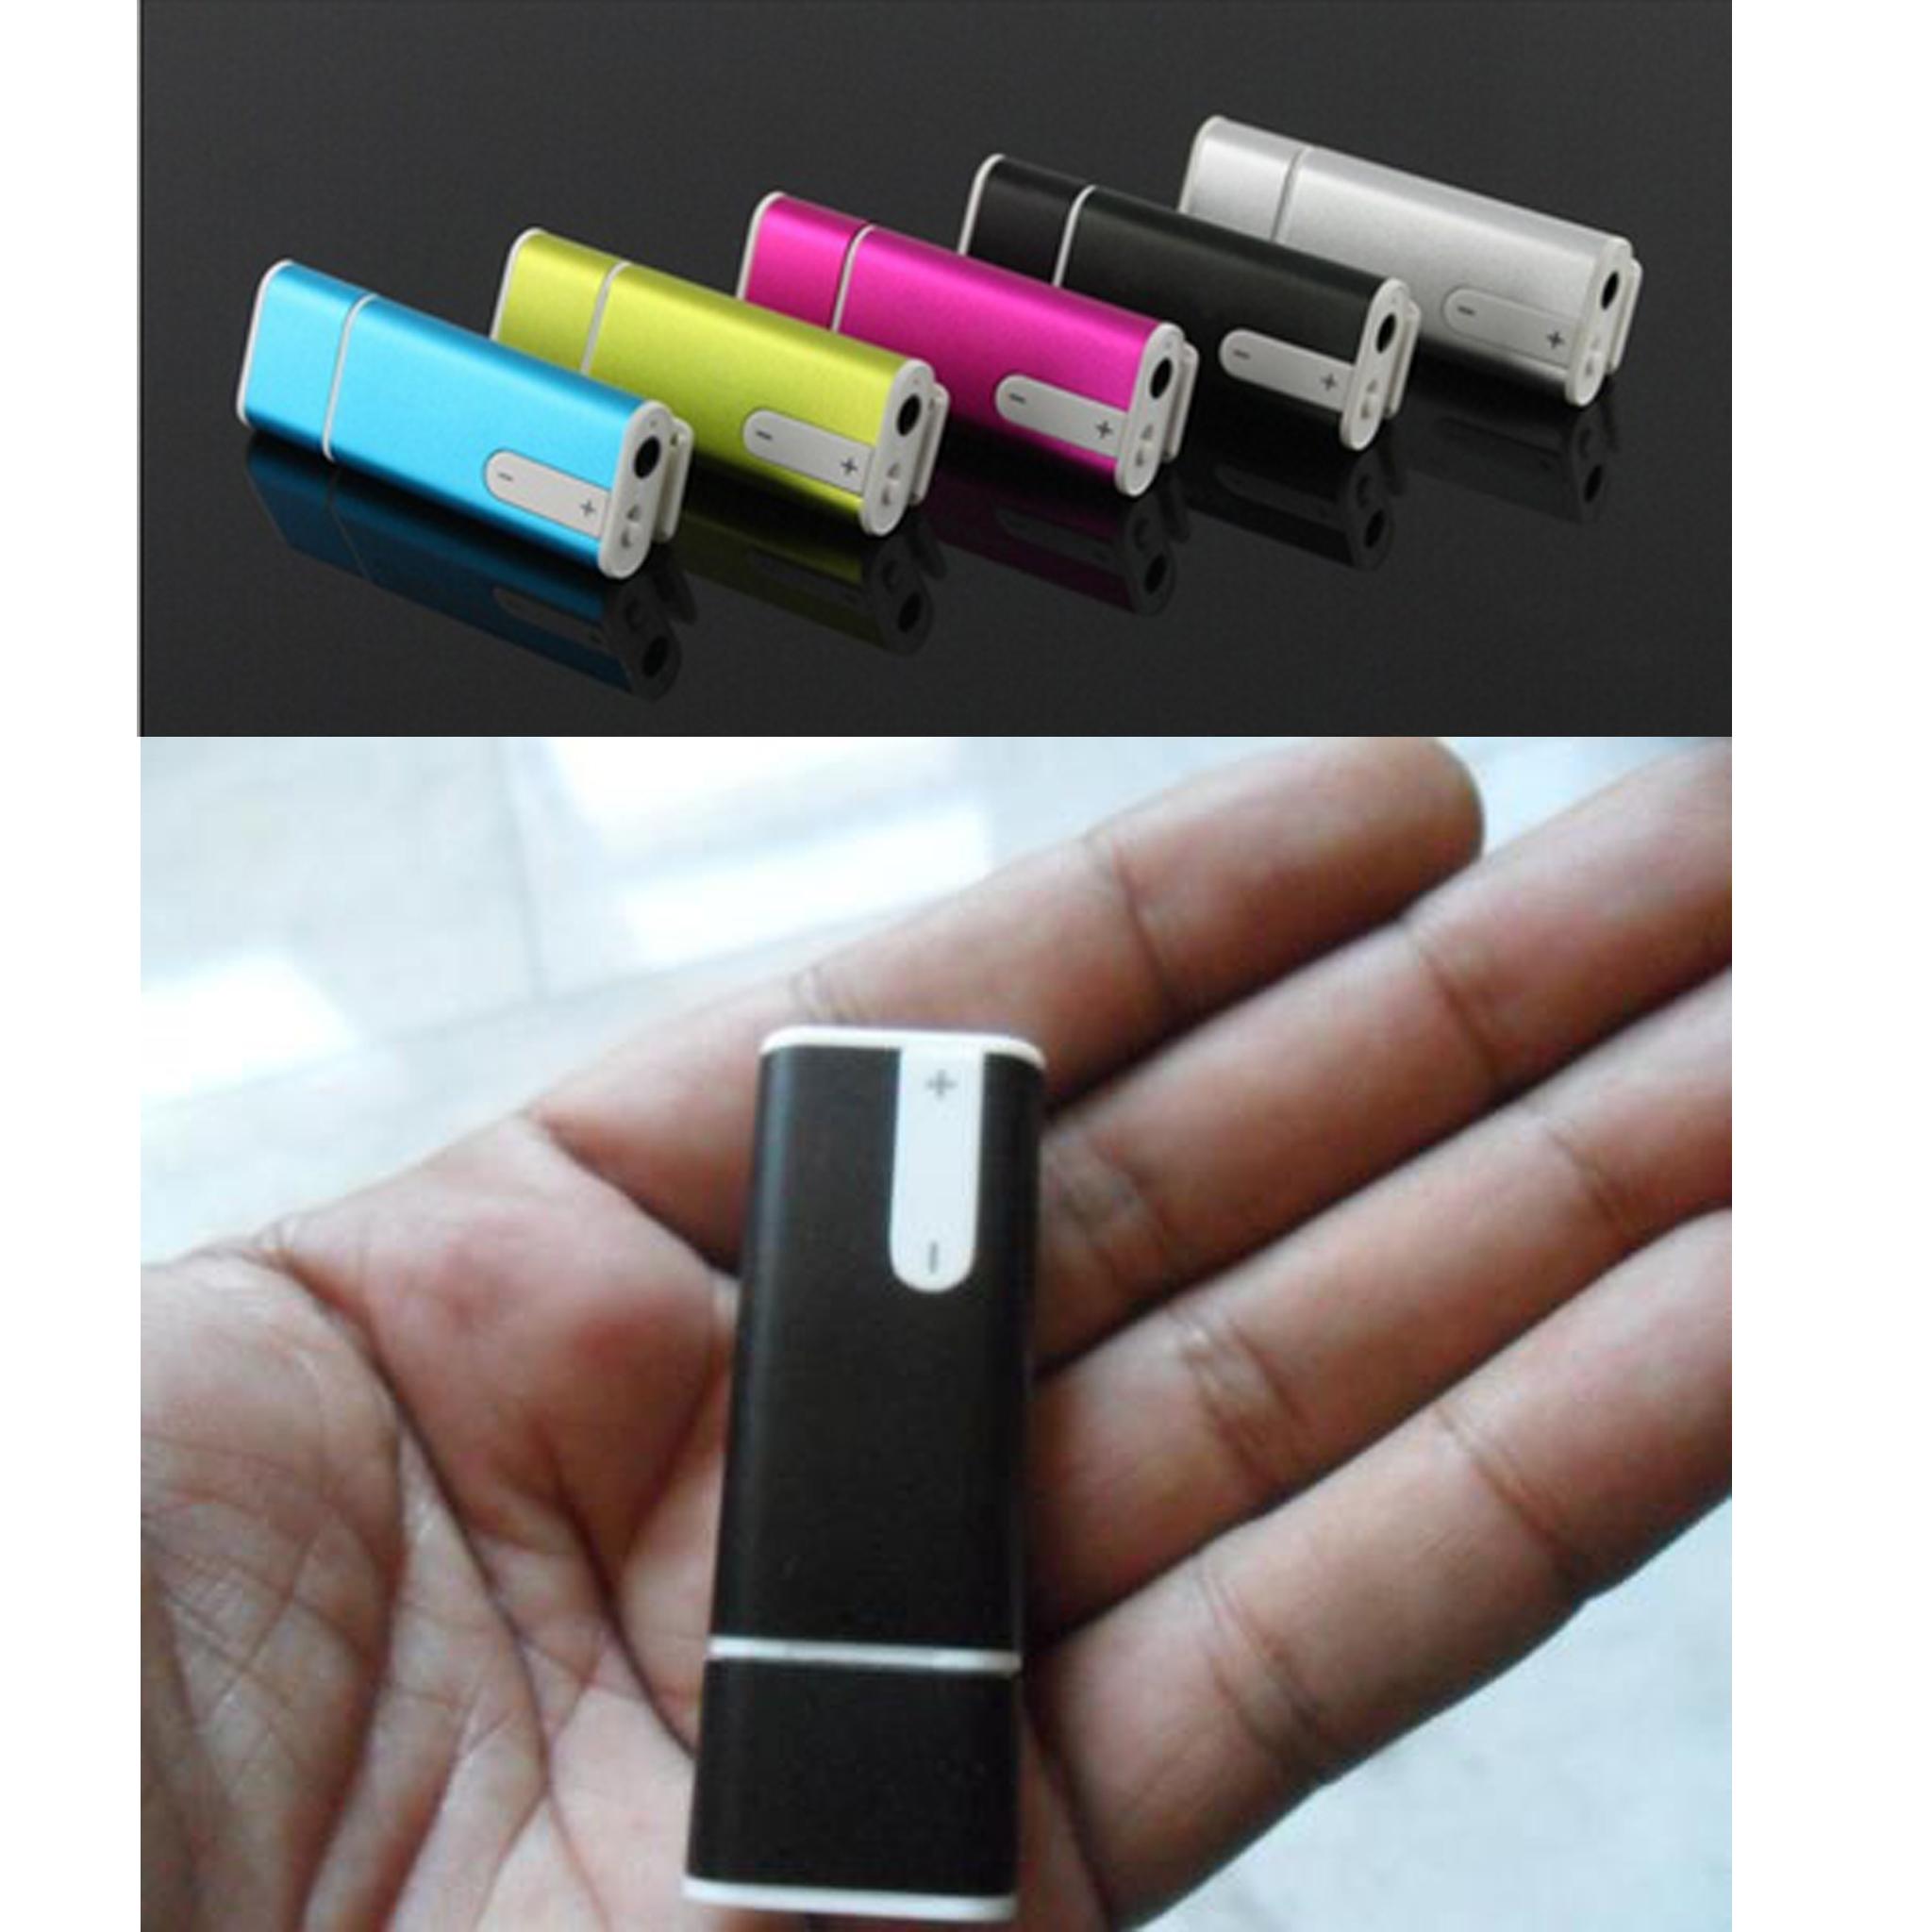 Jual USB FlashDisk + Mini Clip 8GB + Voice Recorder + MP3 Player - FW22  